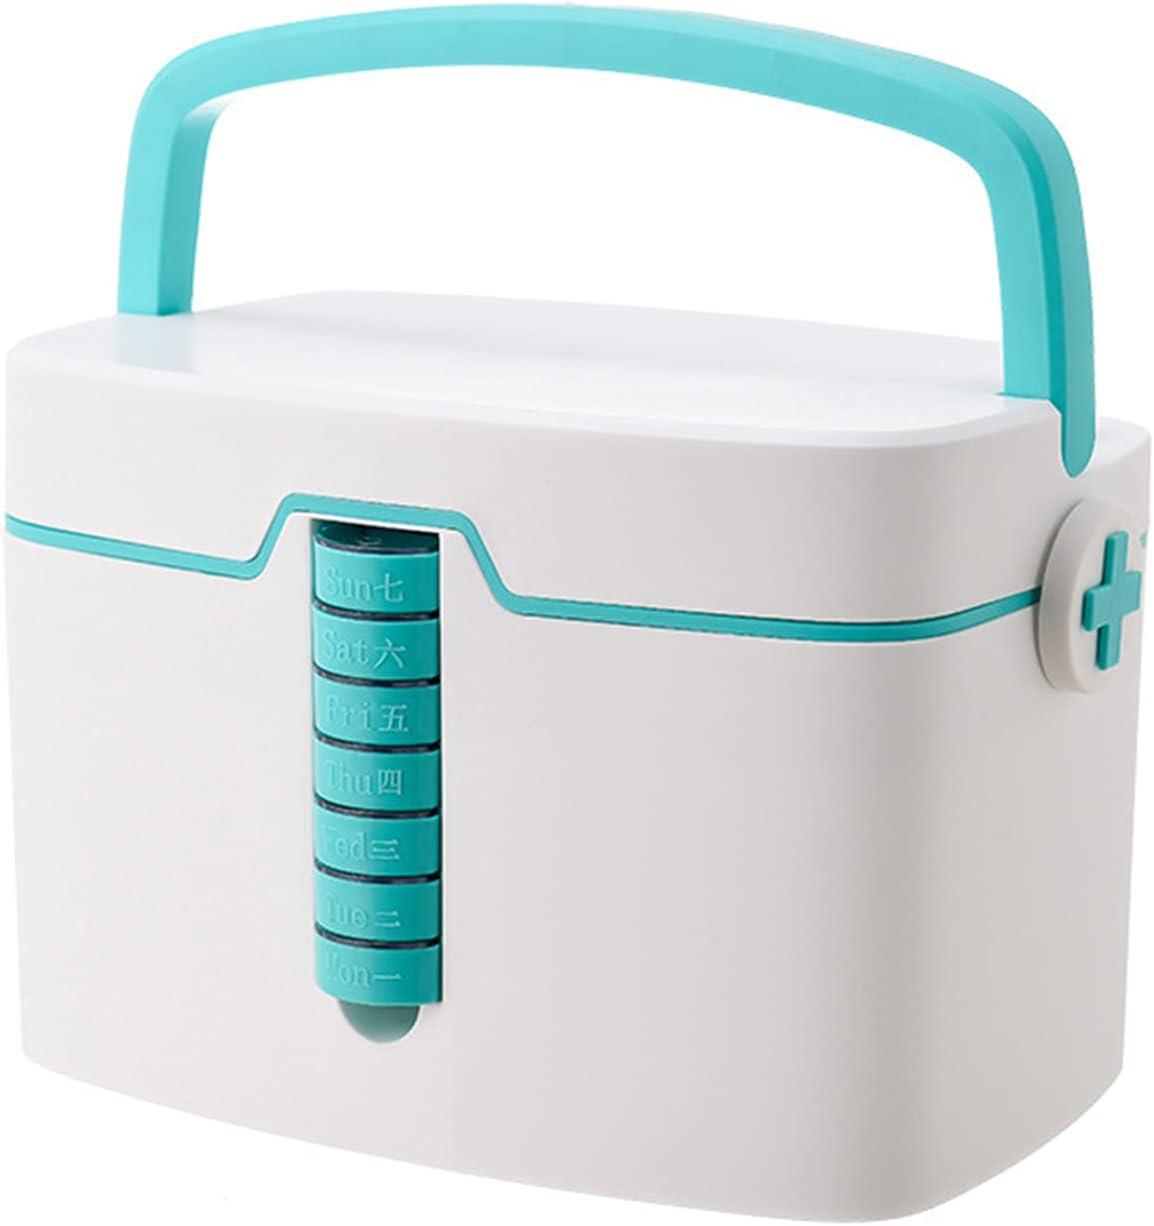 Bargain sale PIVTXRQS Storage Box Medications wit Medical HousePharmacy OFFicial site